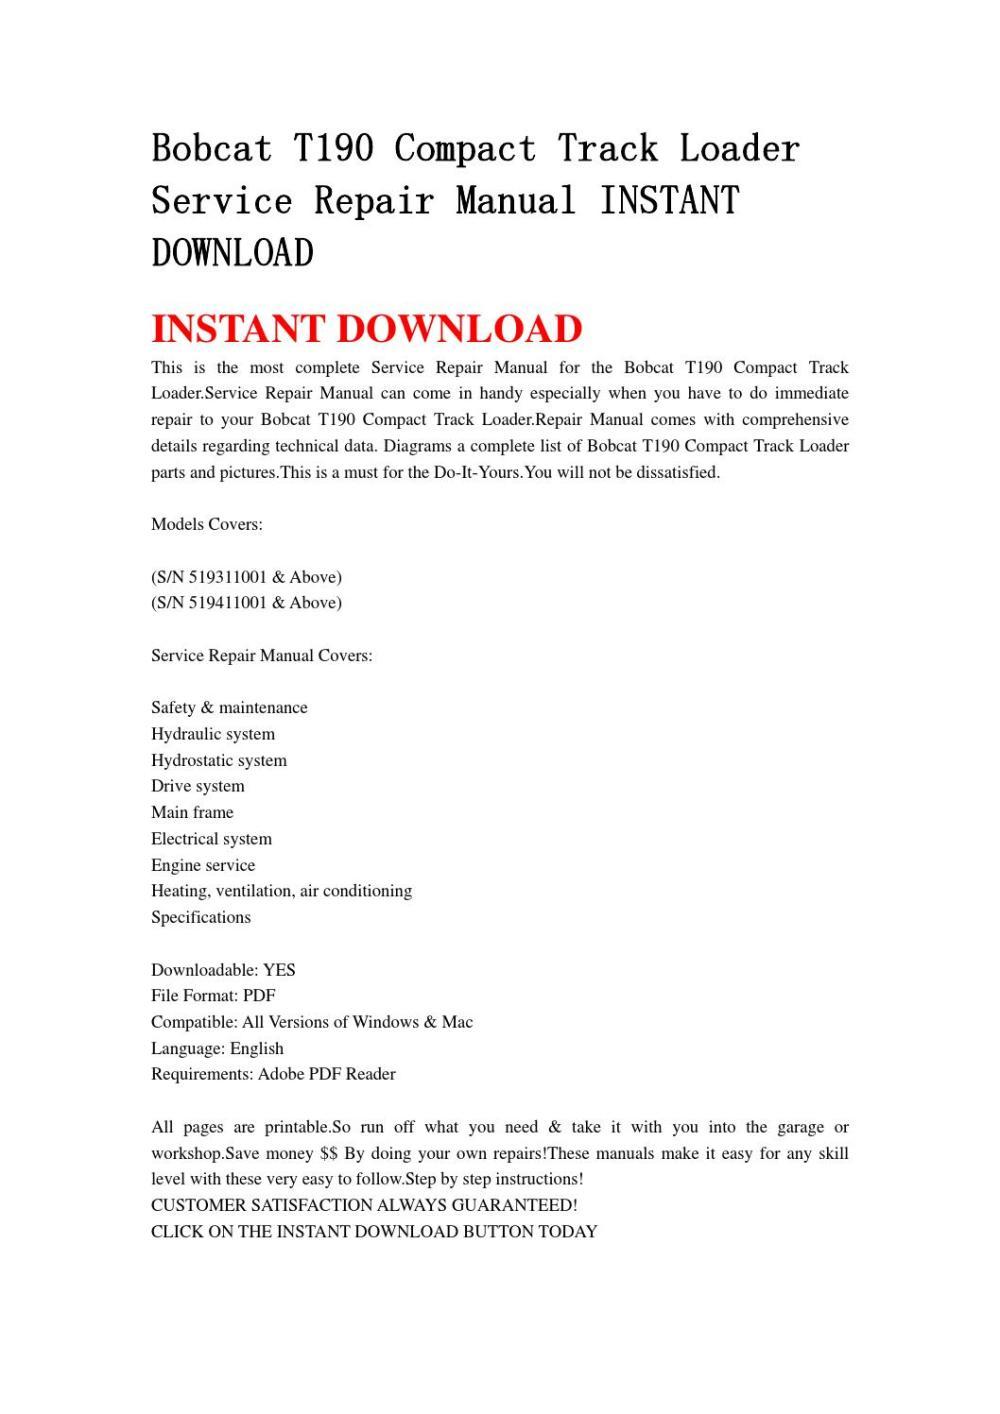 medium resolution of bobcat t190 compact track loader service repair manual instant download0